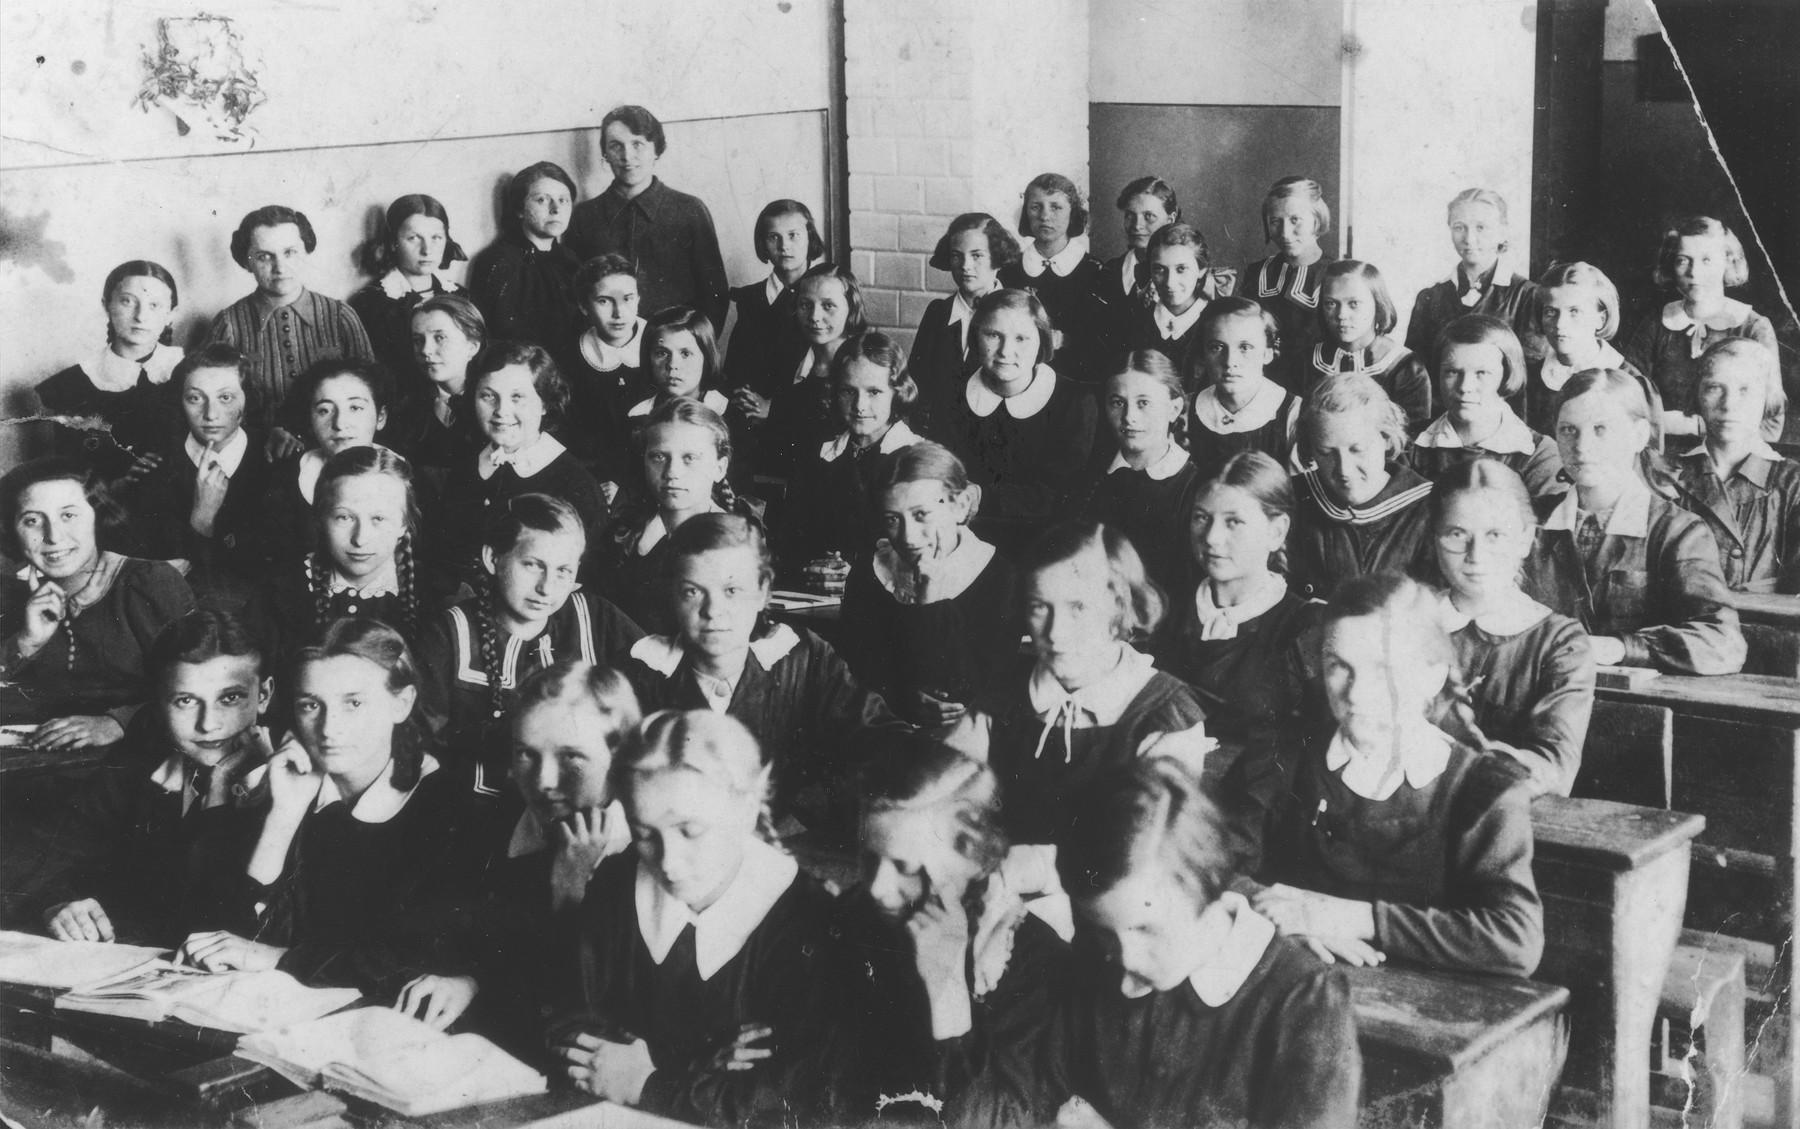 Seventh grade students and teachers pose in their classroom at the public school on Narutowicza Street in Dabrowa Gornicza.    Among those pictured are Pola Rozen; Frania Magierkiewicz; Hanka Lewkowicz; Zosia Putersznyt, Sala Szmeker; and the teacher, Mrs. Kaufiszer.